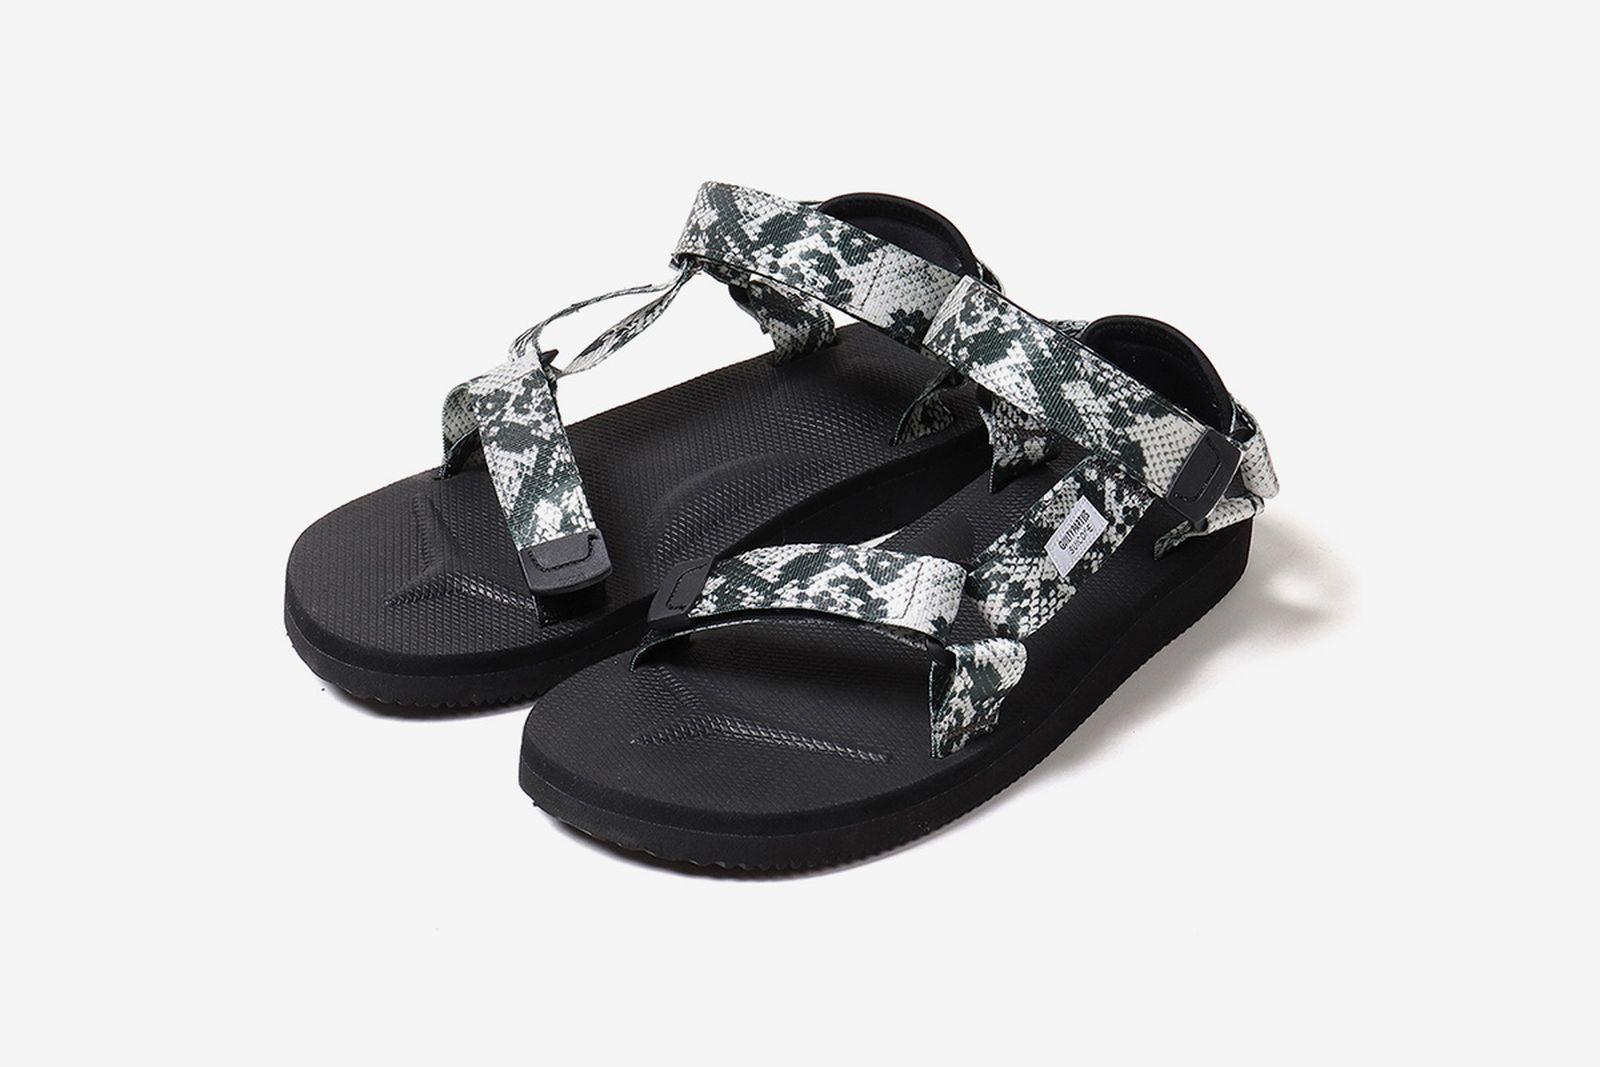 wacko-maria-suicoke-sandals-release-date-price-03